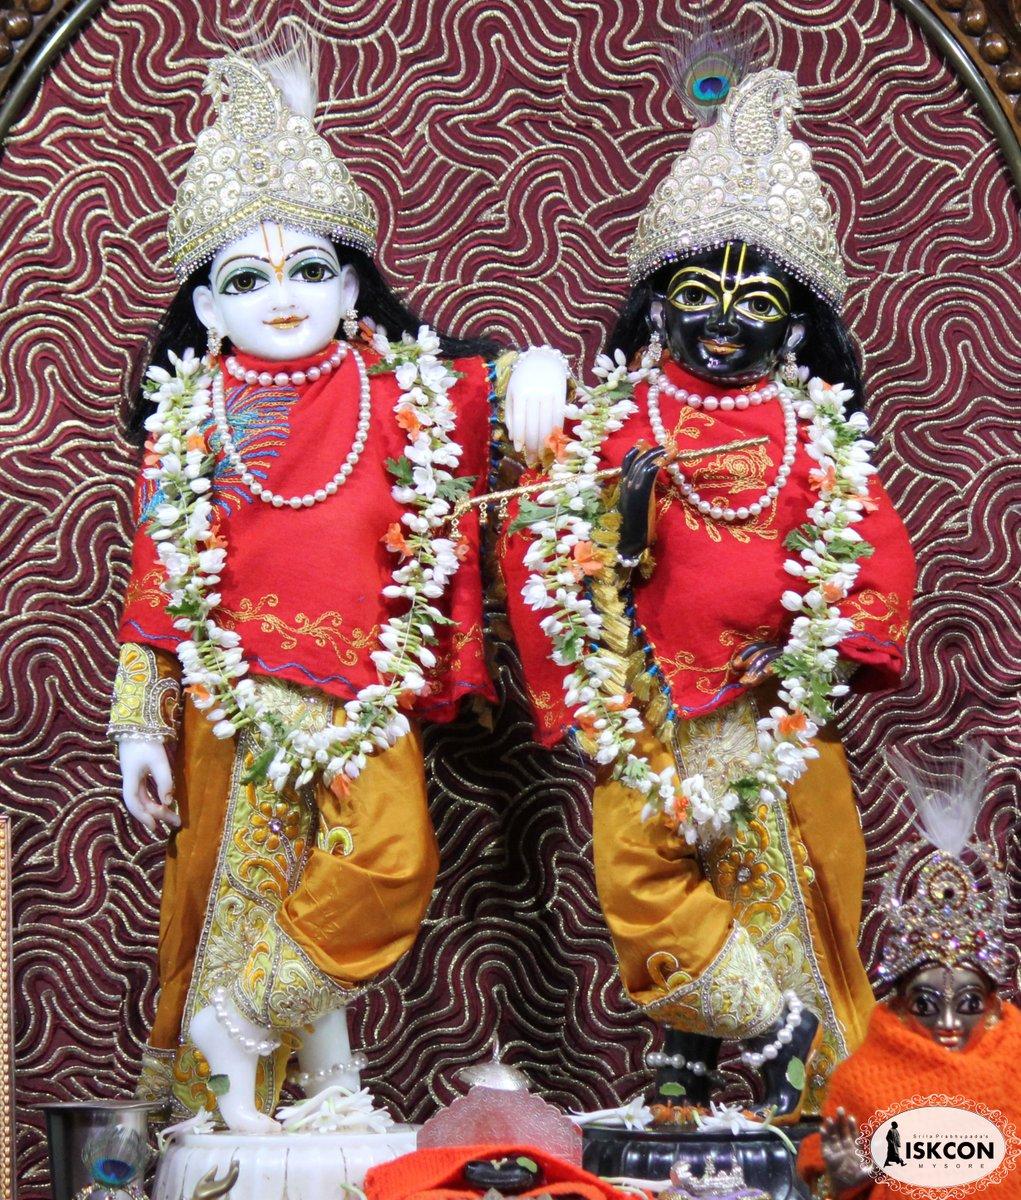 Darshan on 27th January 2021 #ISKCON #Mysuru #DailyDarshan #EarlyMorning #Krishna #27January #temples #worship #Blessings #BestofTheDay   #LordKrishnaLovers #deitydarshan